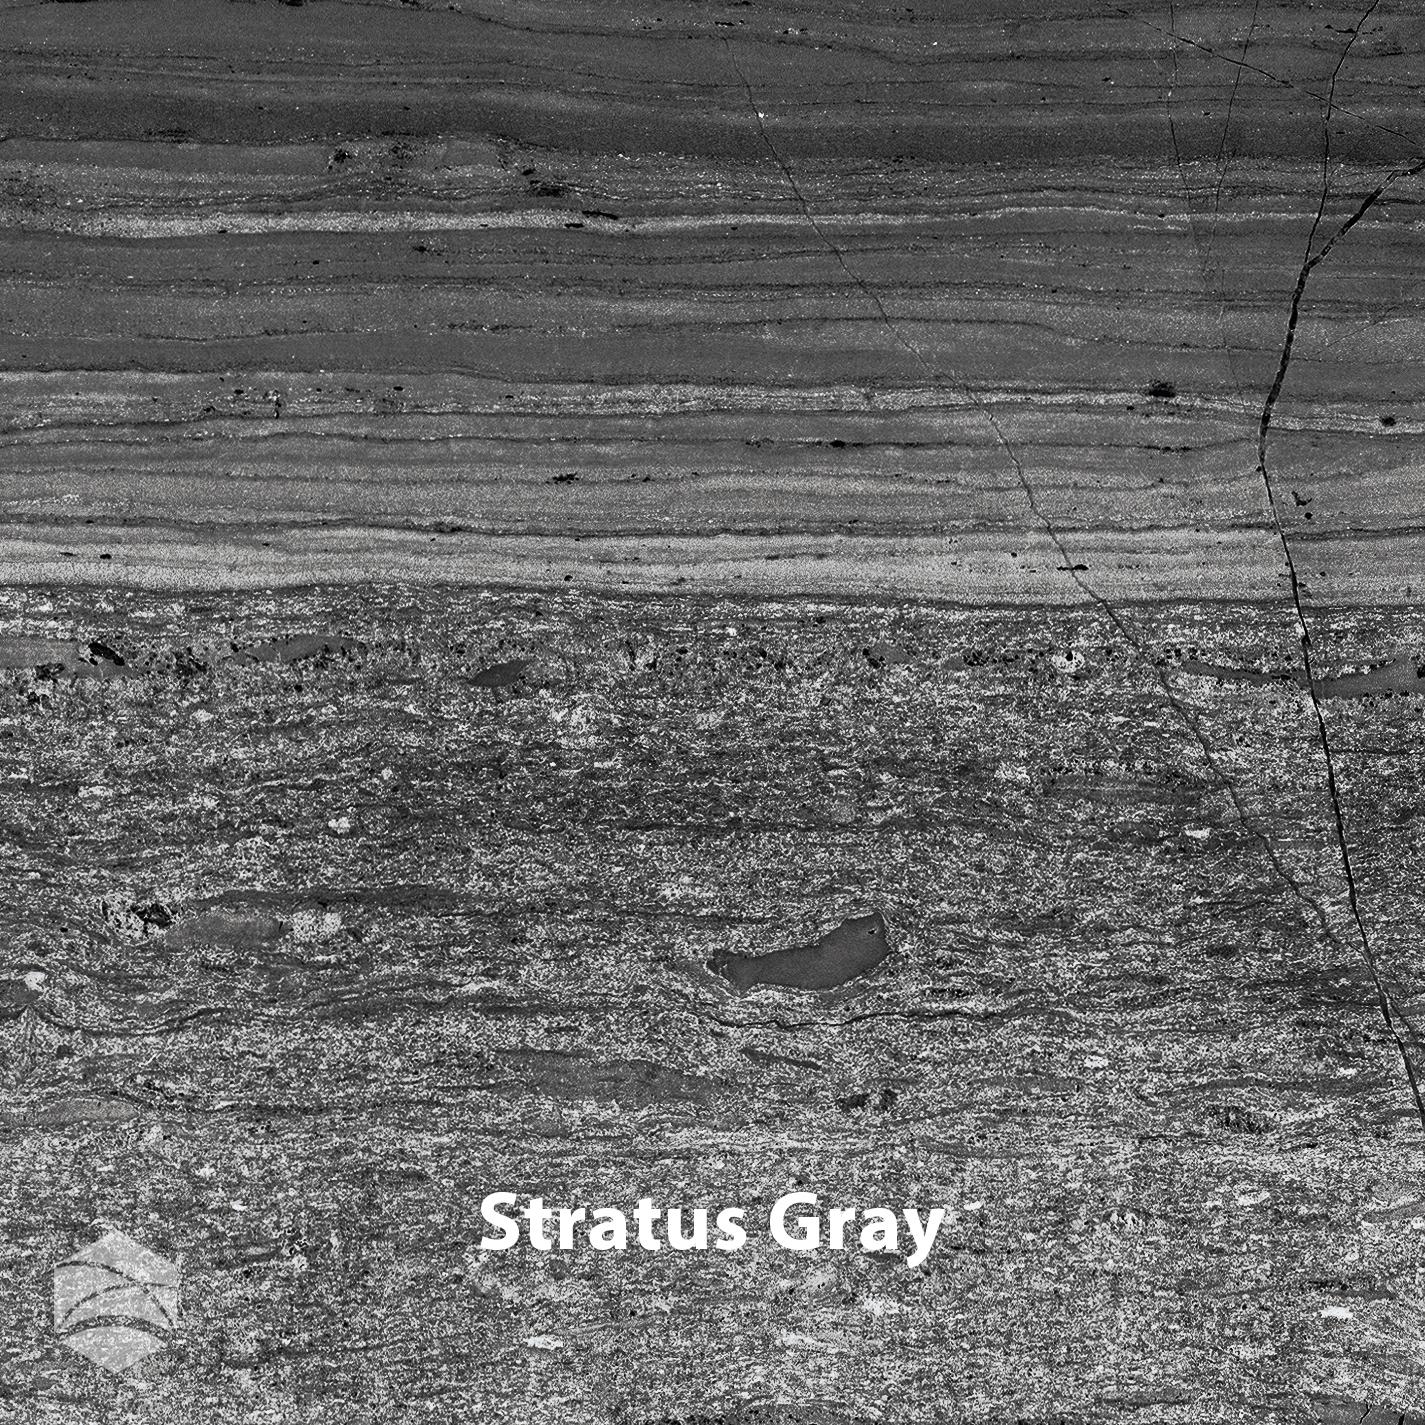 Stratus Gray_V2_14x14.jpg